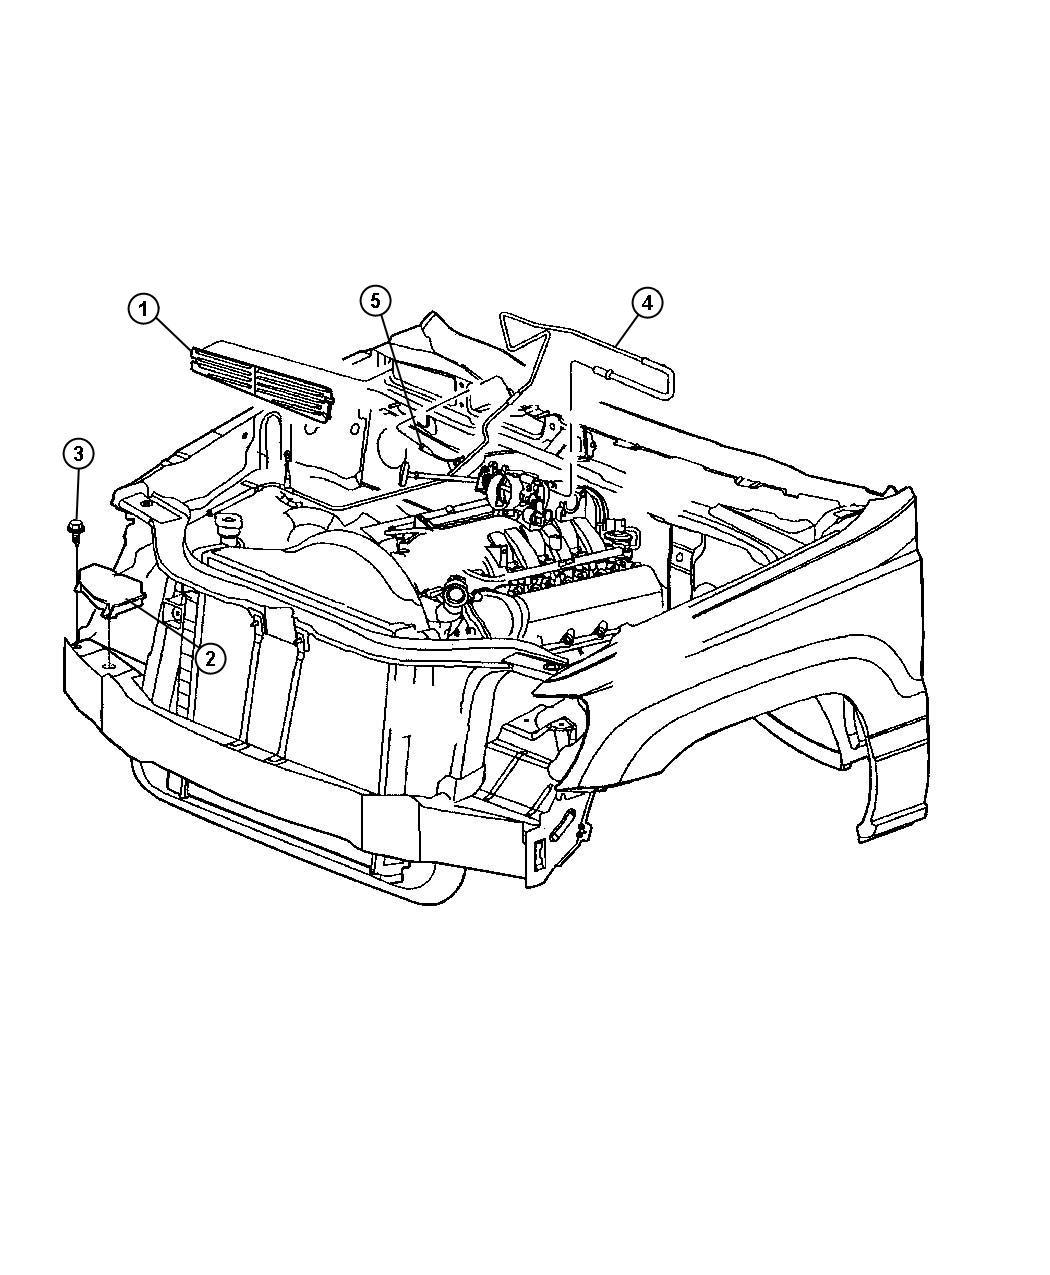 Jeep Grand Cherokee Sport 4 7l V8 Mpi 5 Spd Automatic 5 45rfe Hevac Vacuum Engine Lines